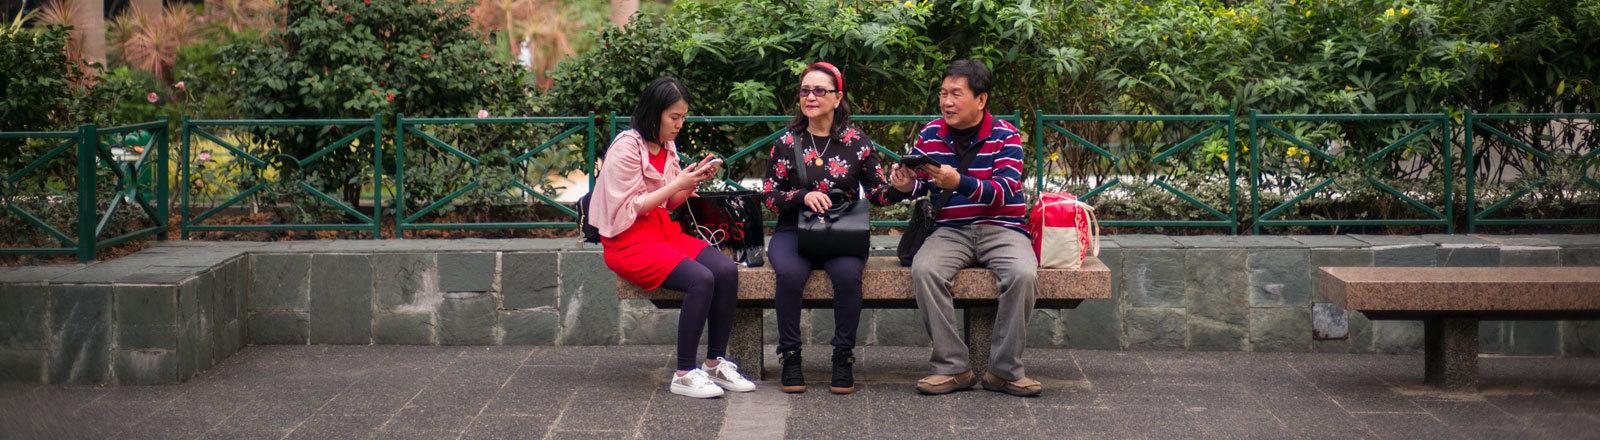 Kleinfamilie in Hongkong, März 2017